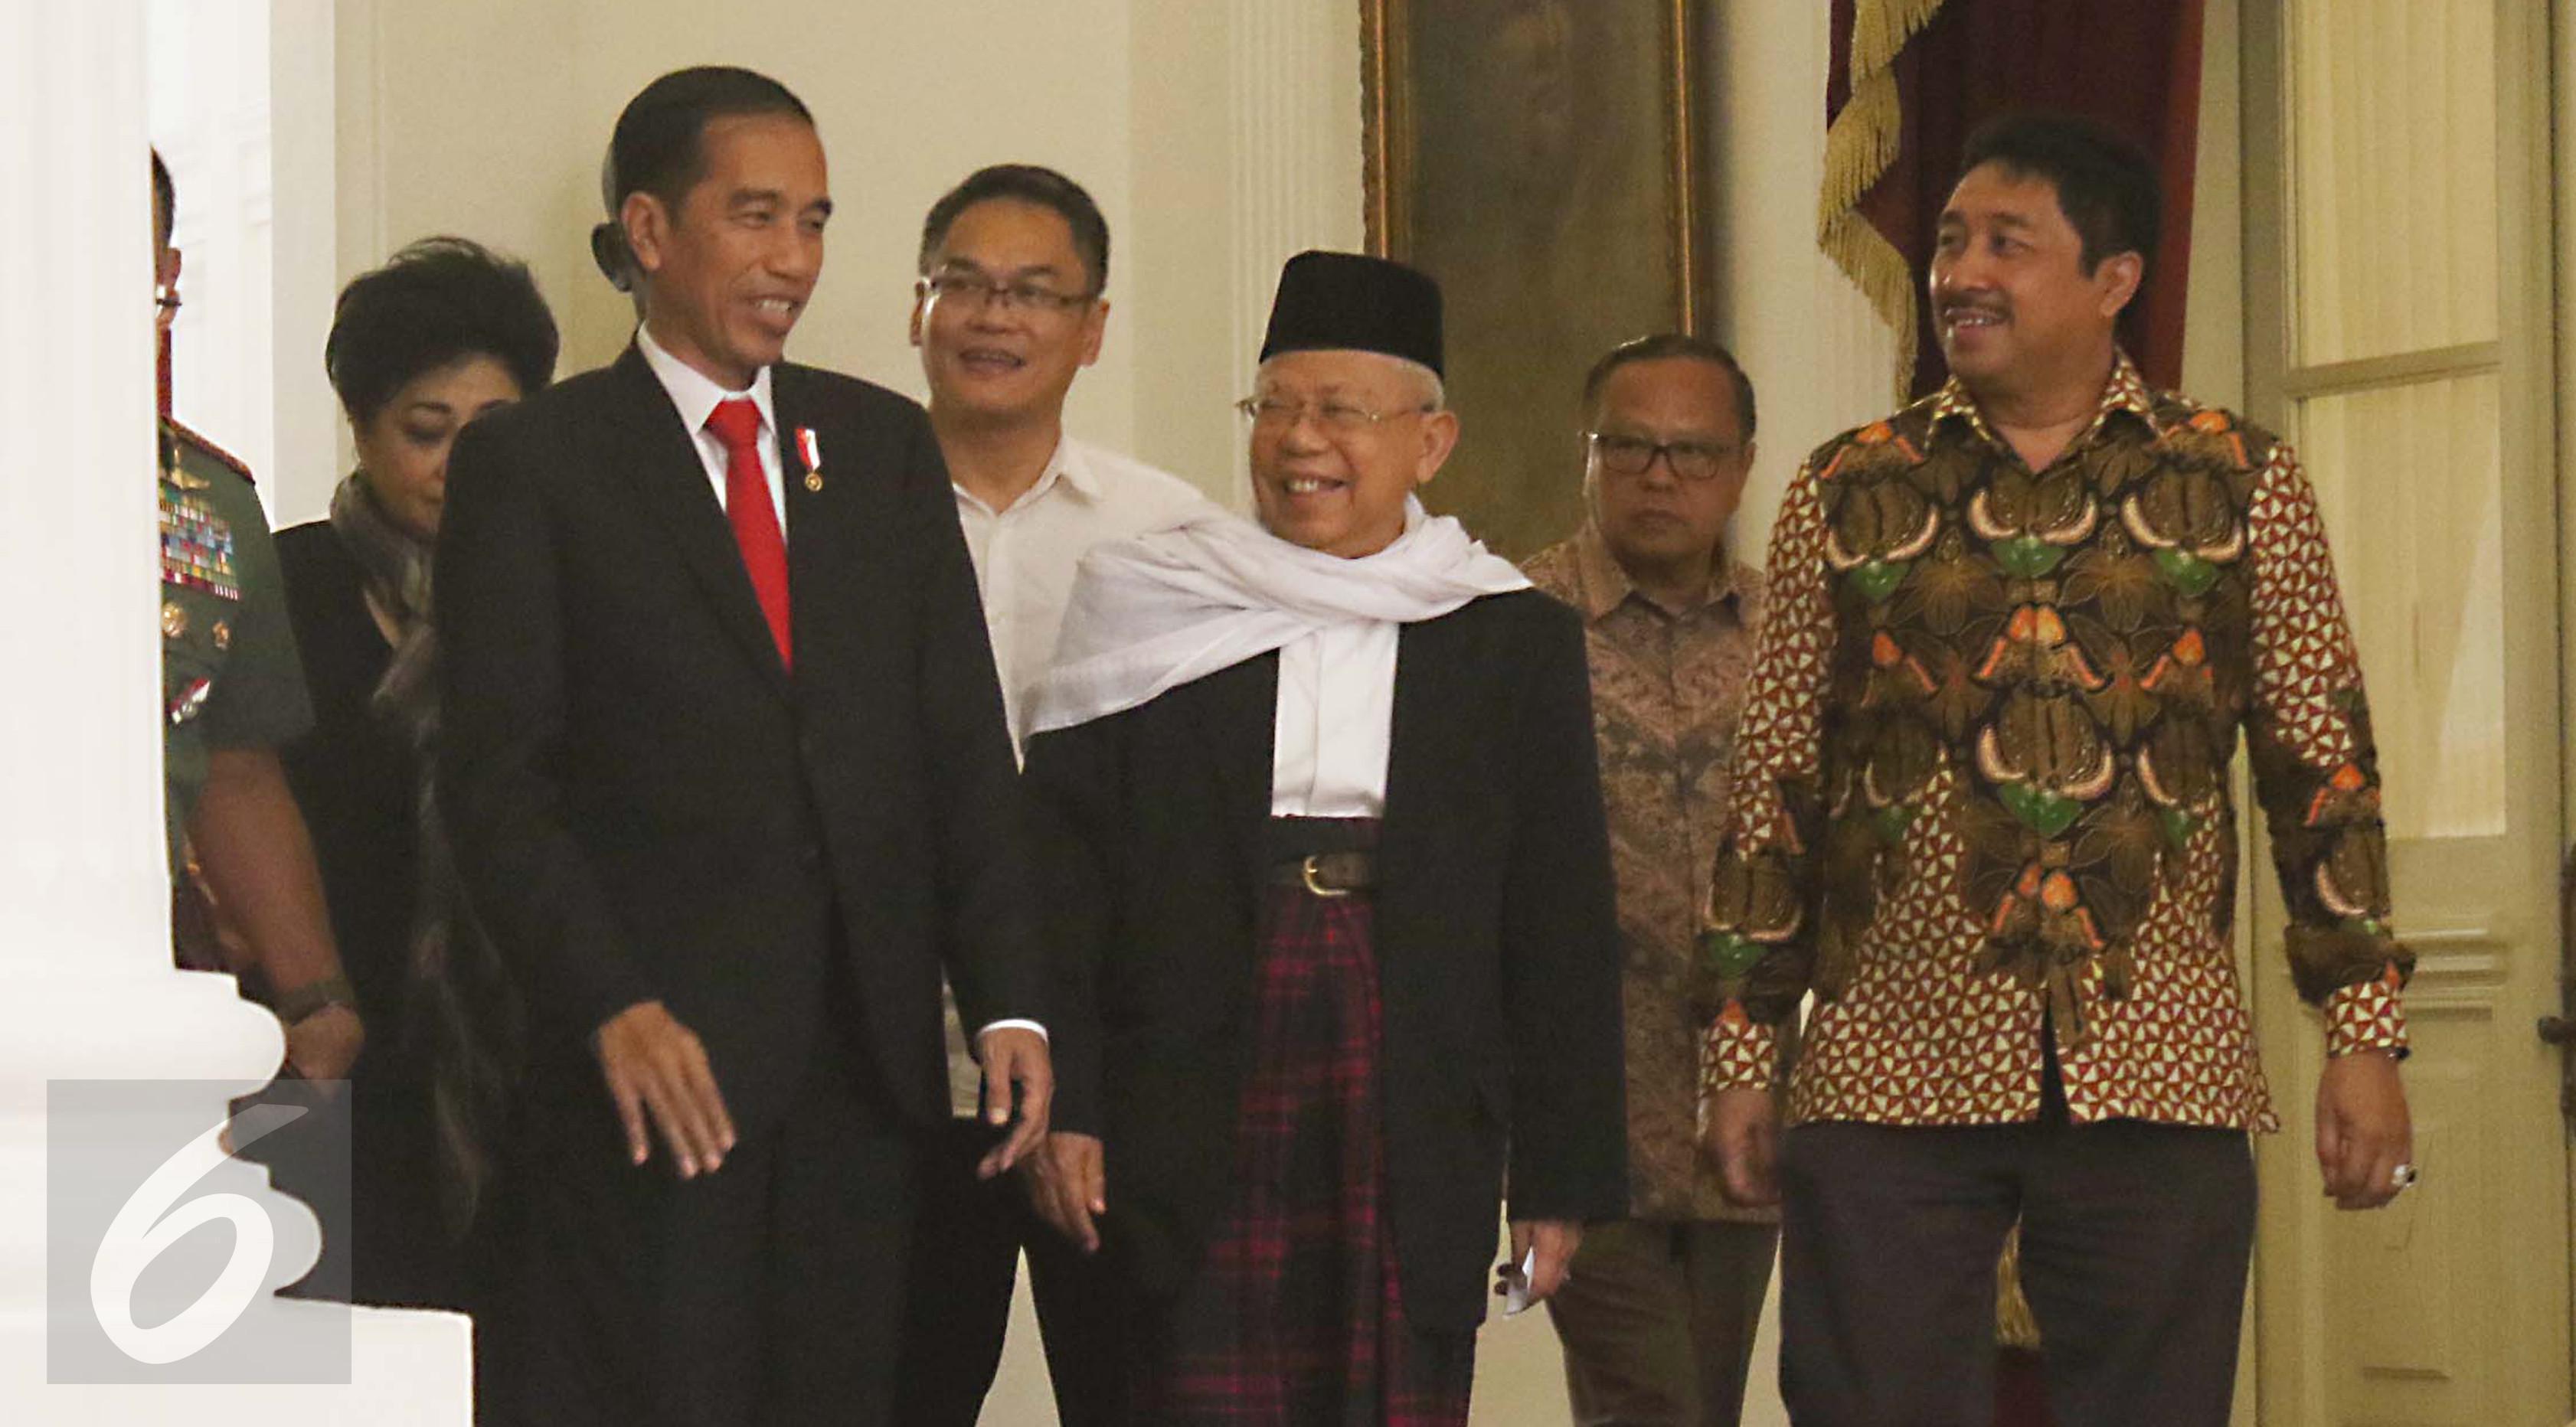 Presiden Jokowi saat menerima delapan tokoh dari organisasi lintas agama di Istana Merdeka, Jakarta, Selasa (16/5). Perwakilan organisasi yang hadir antara lain PBNU, Muhammadiyah, MUI, Wali Gereja Indonesia, PGI dan lainnya. (Liputan6.com/Angga Yuniar)